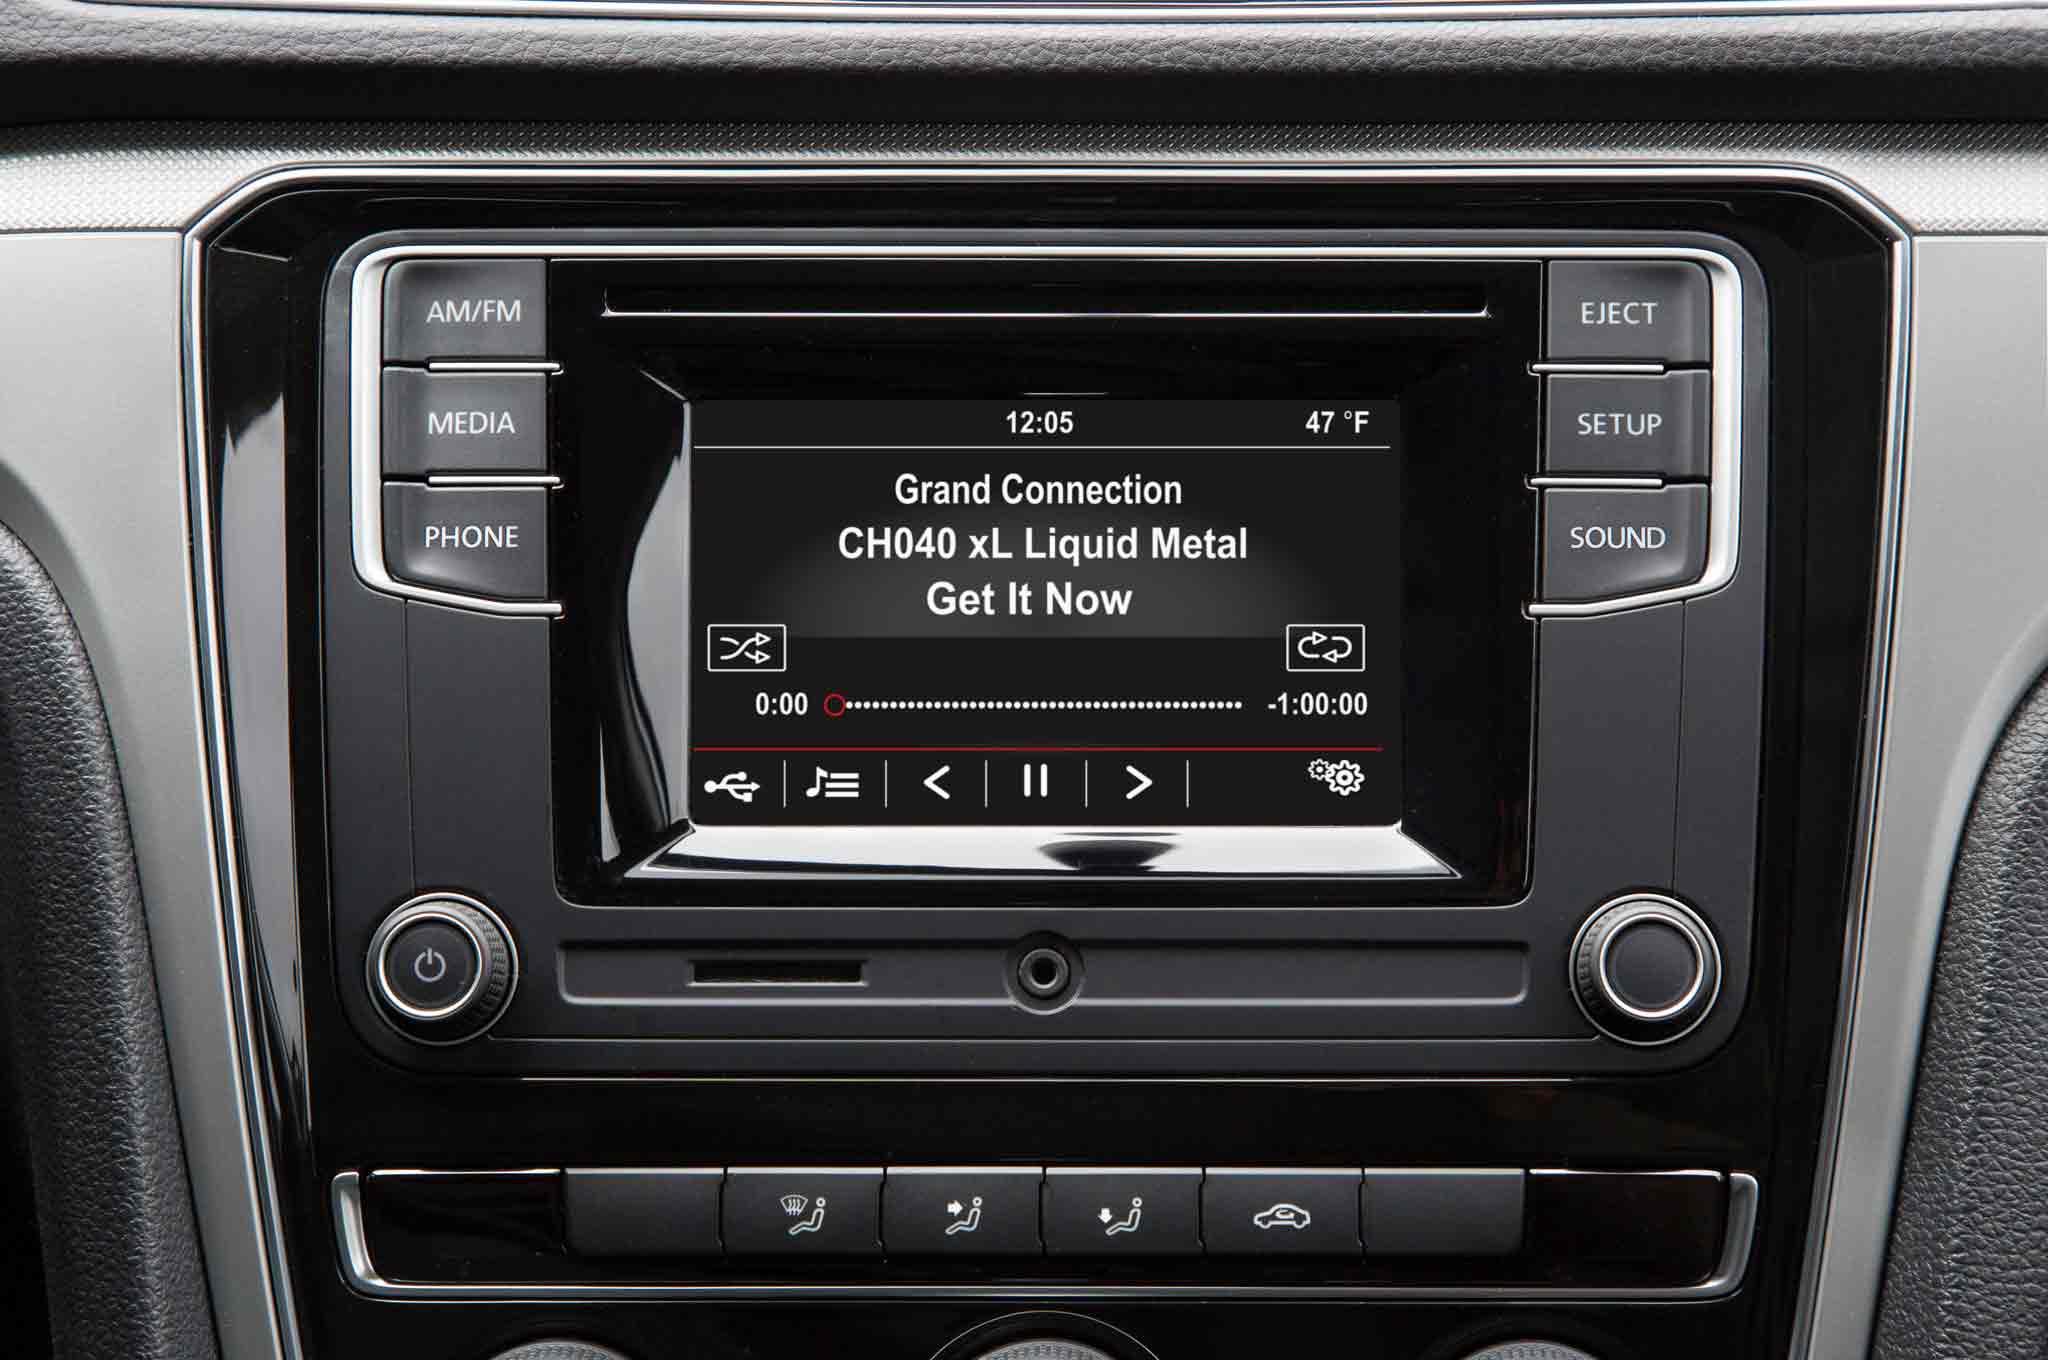 Siriusxm Satellite Radio Car Kit For 2014 2018 Ford